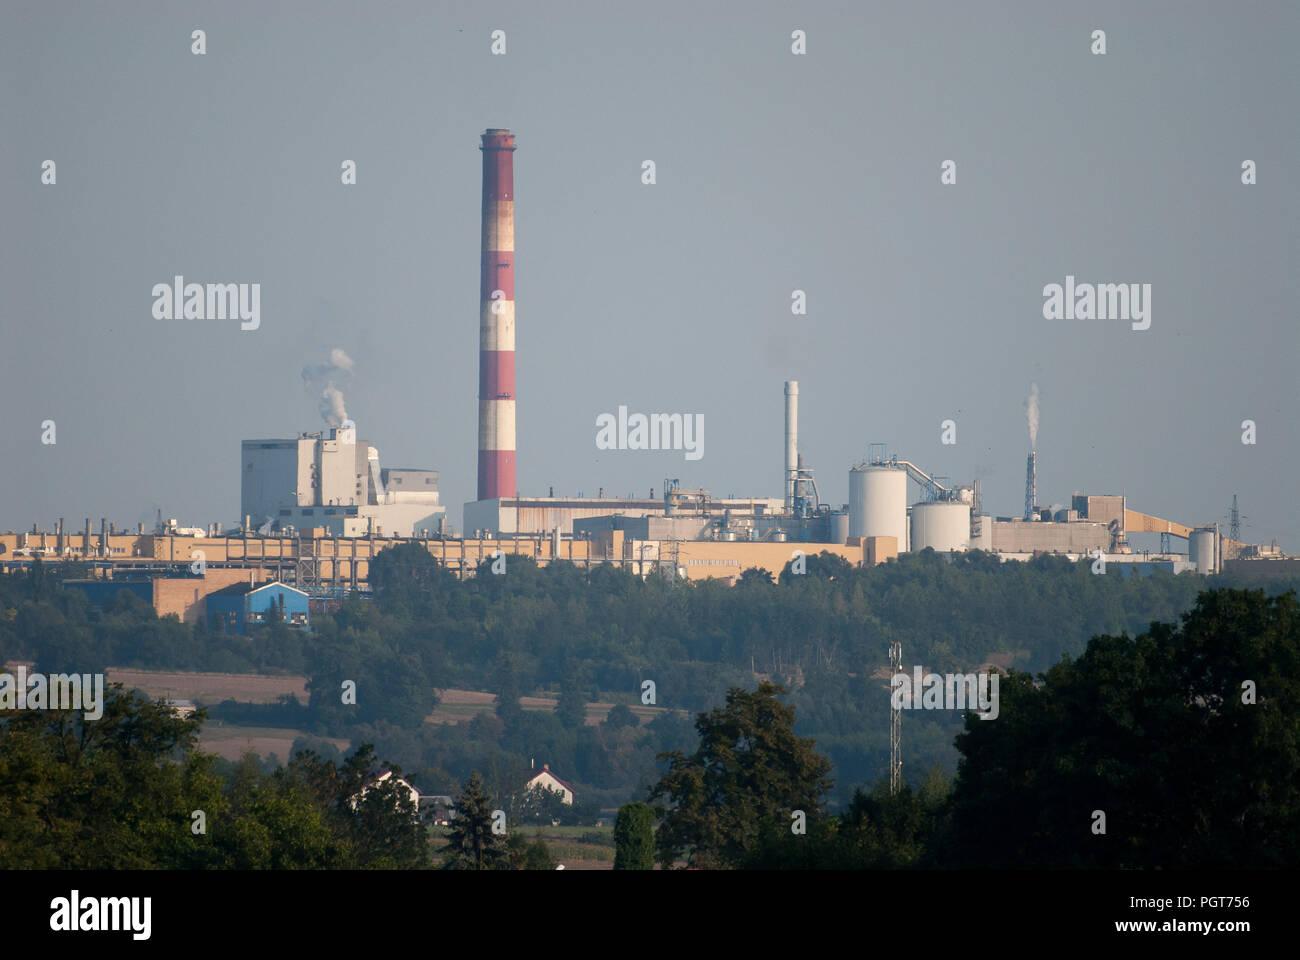 Paper Pulp Stock Photos & Paper Pulp Stock Images - Alamy